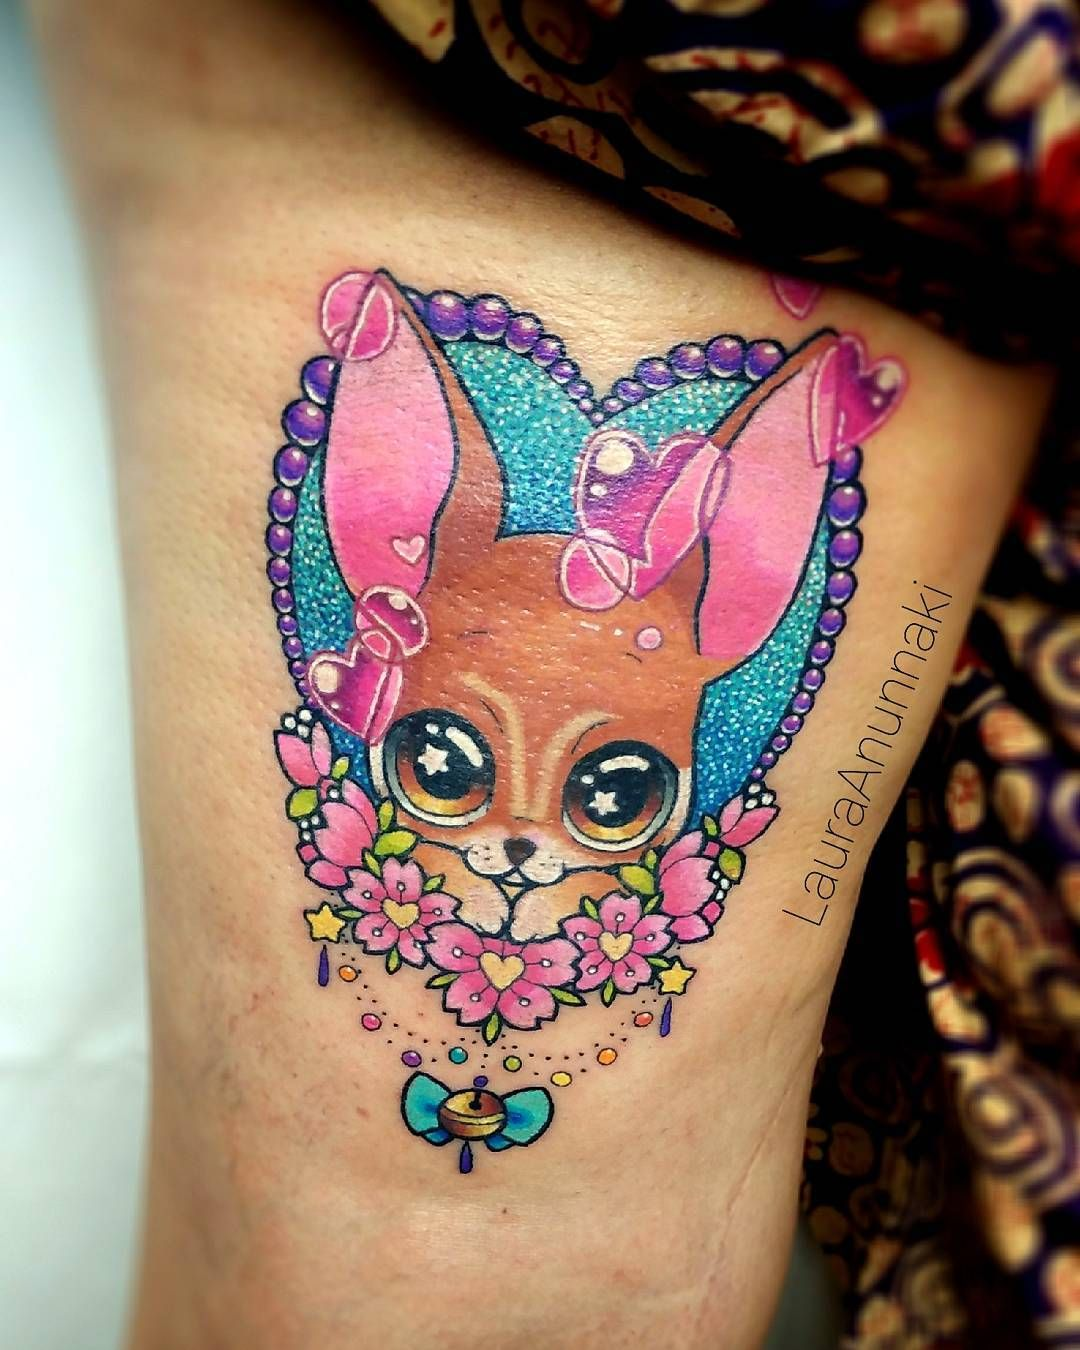 Holi, espero les guste este tatuaje de este perrito #chihuahua ...